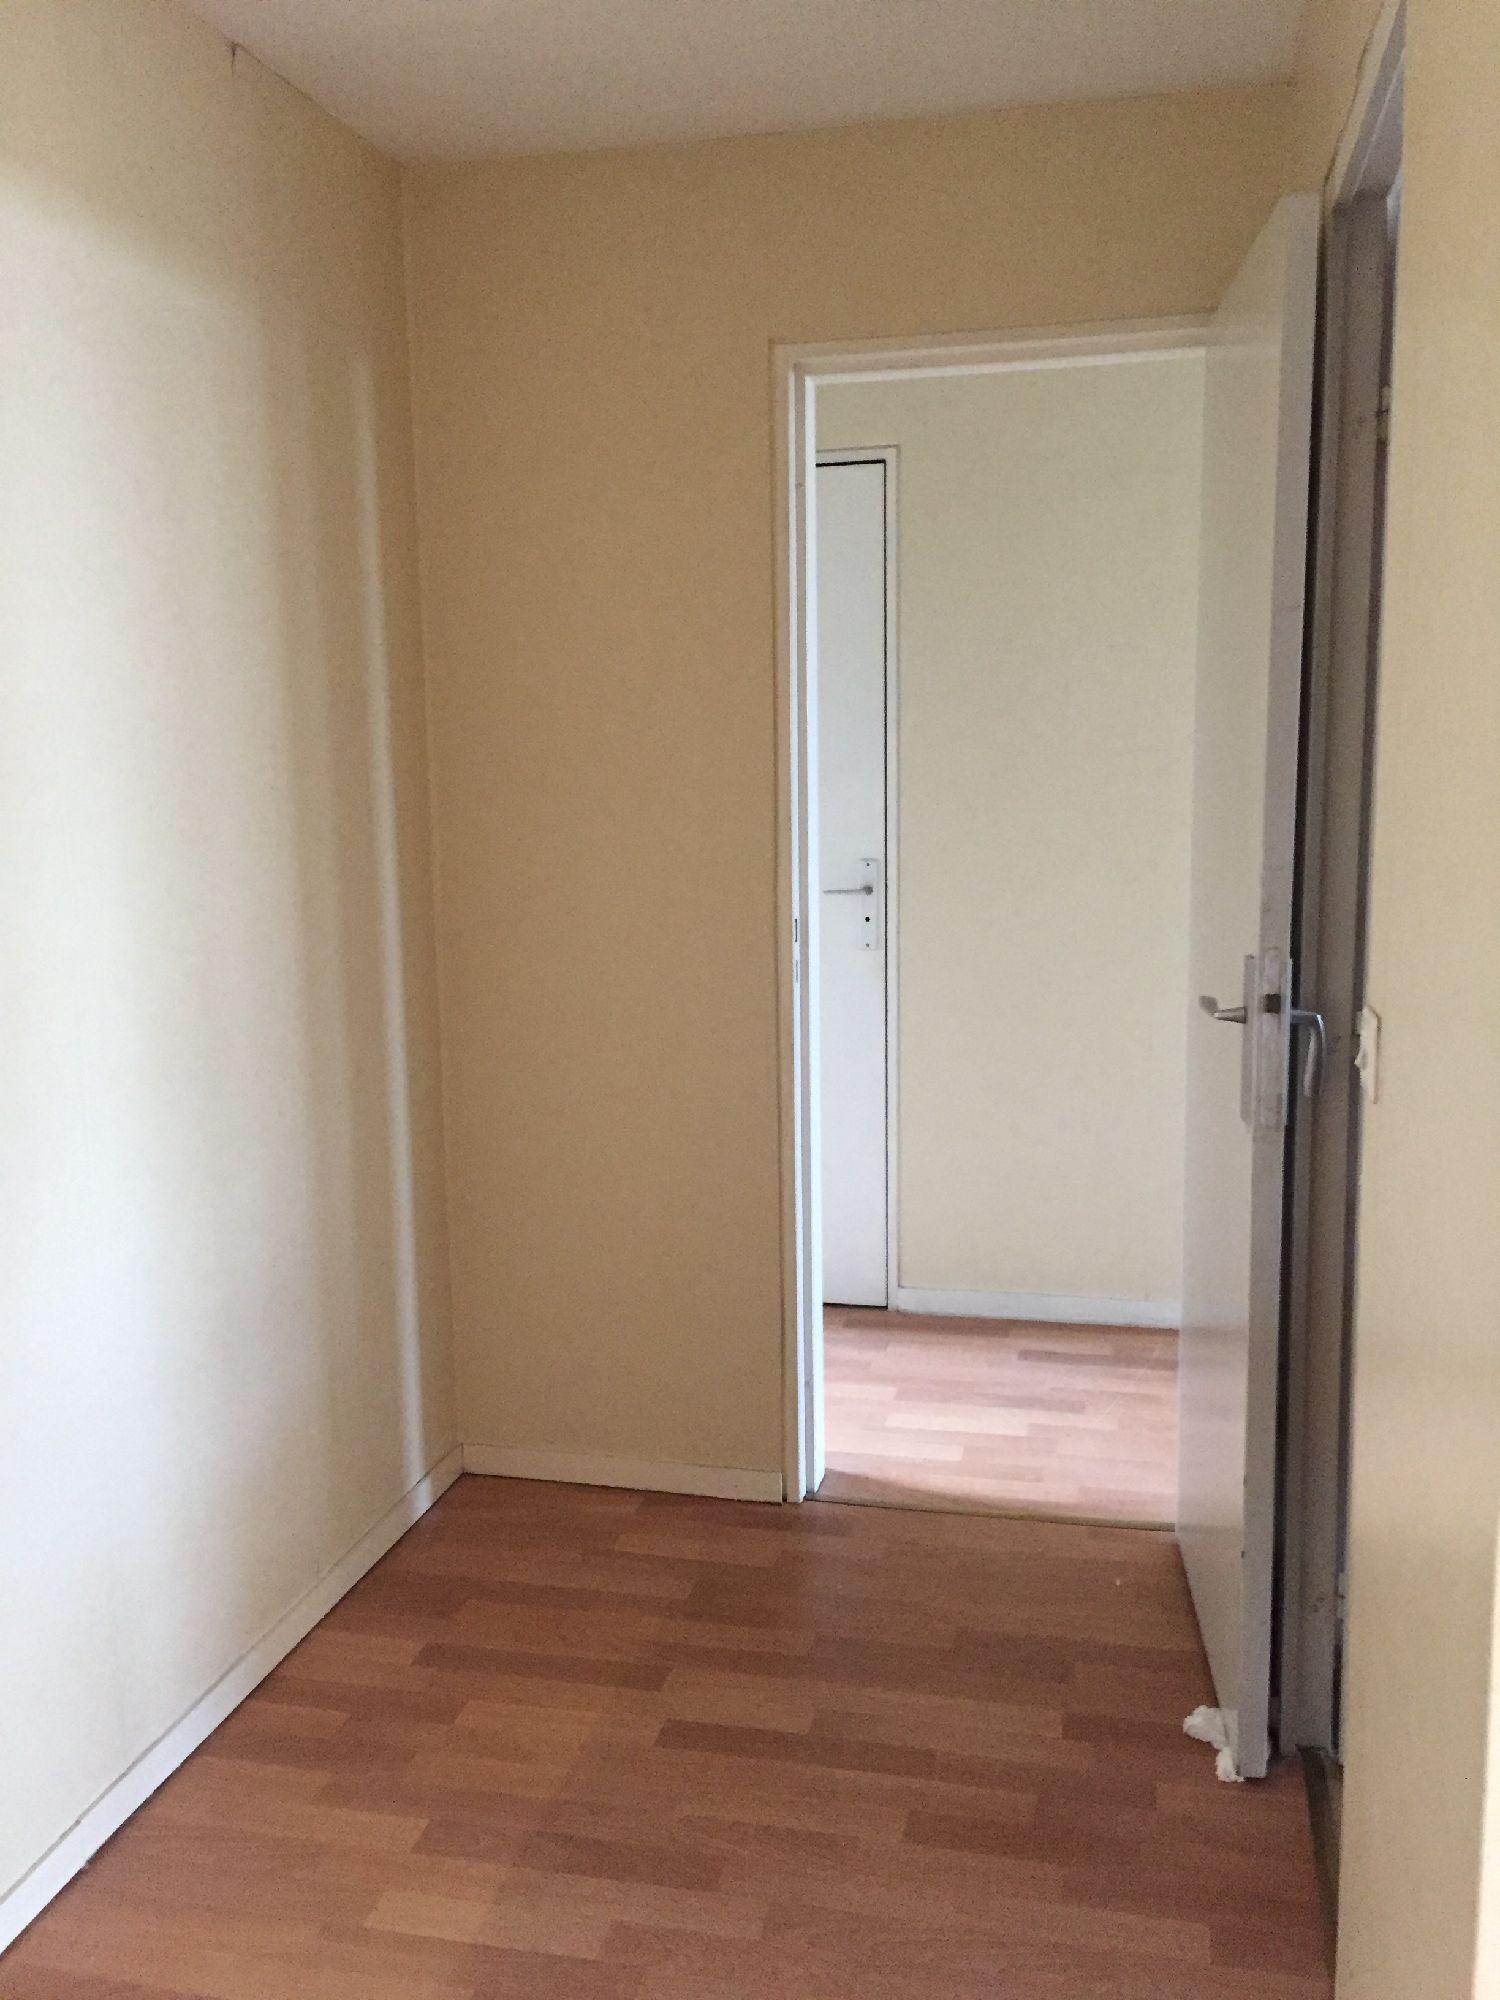 vente appartement valenciennes prix 129 000 hni ref 59175 932. Black Bedroom Furniture Sets. Home Design Ideas